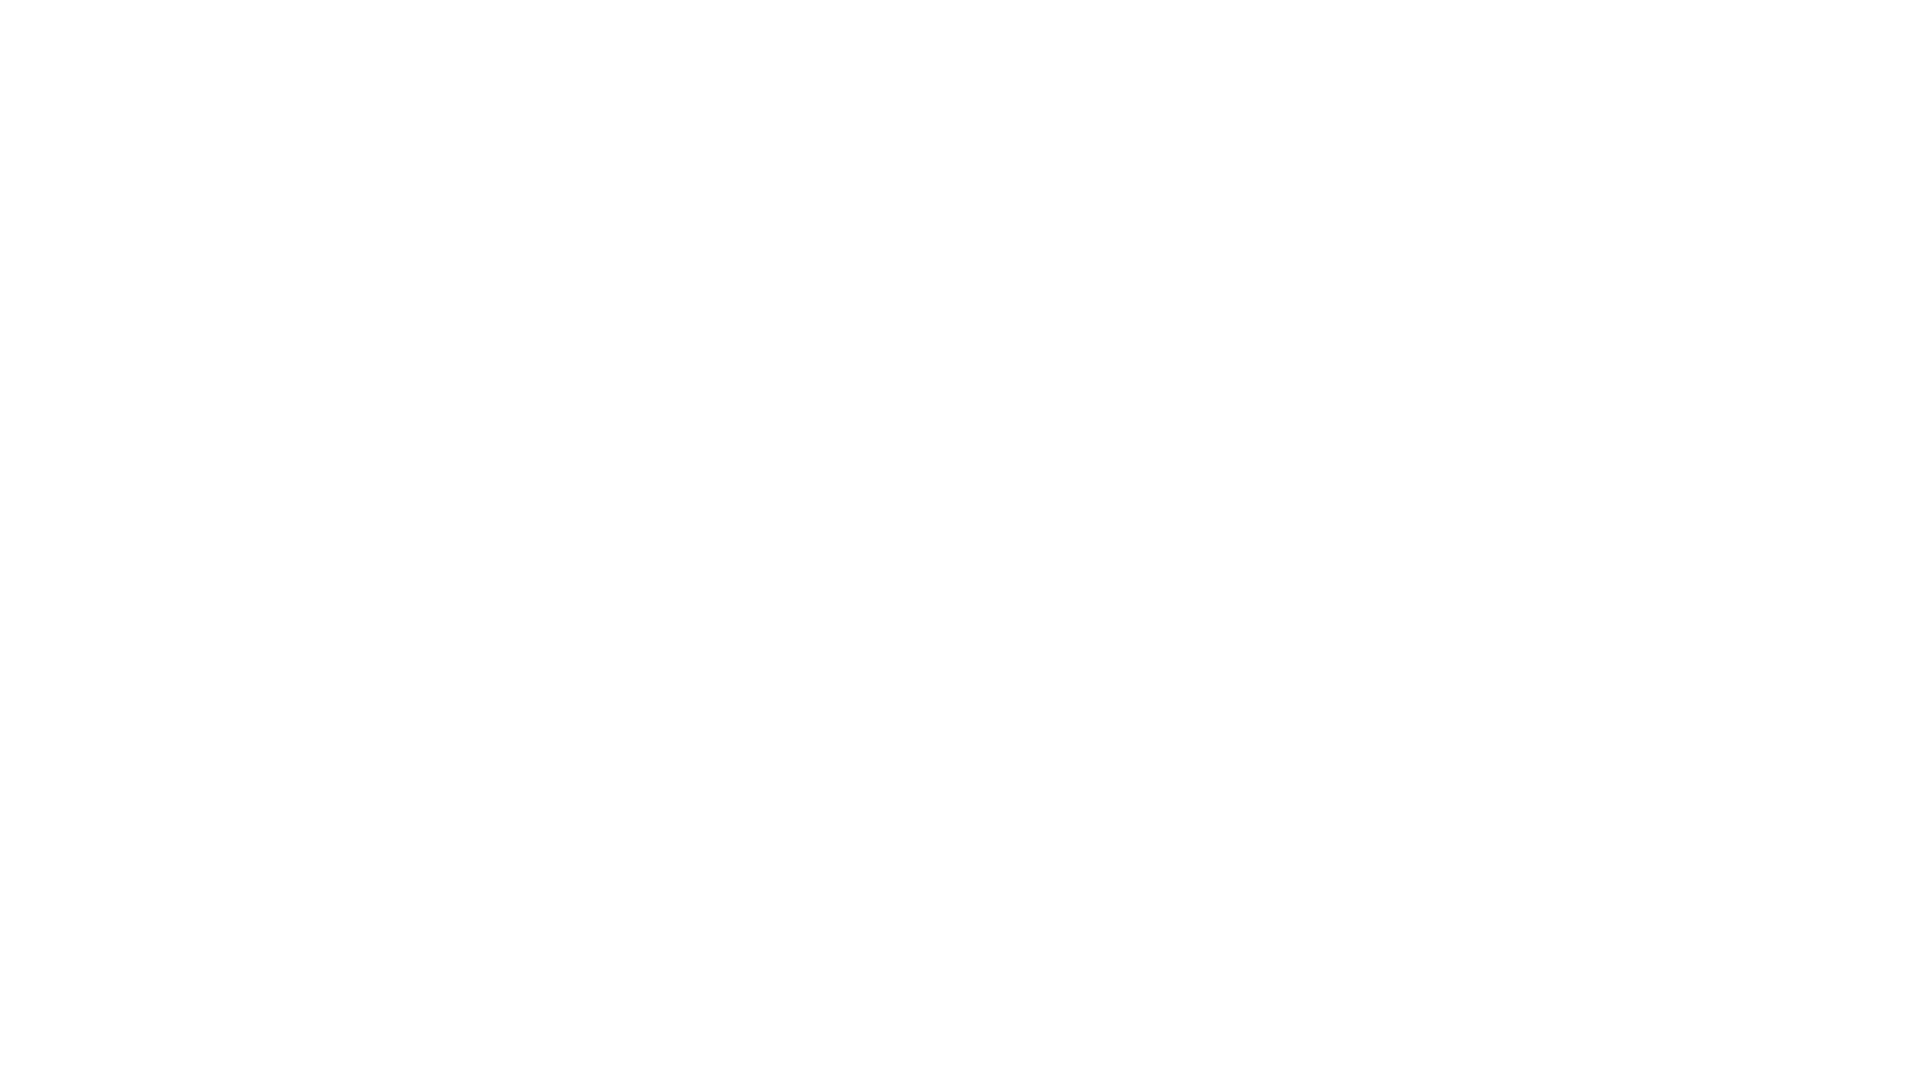 whitebg